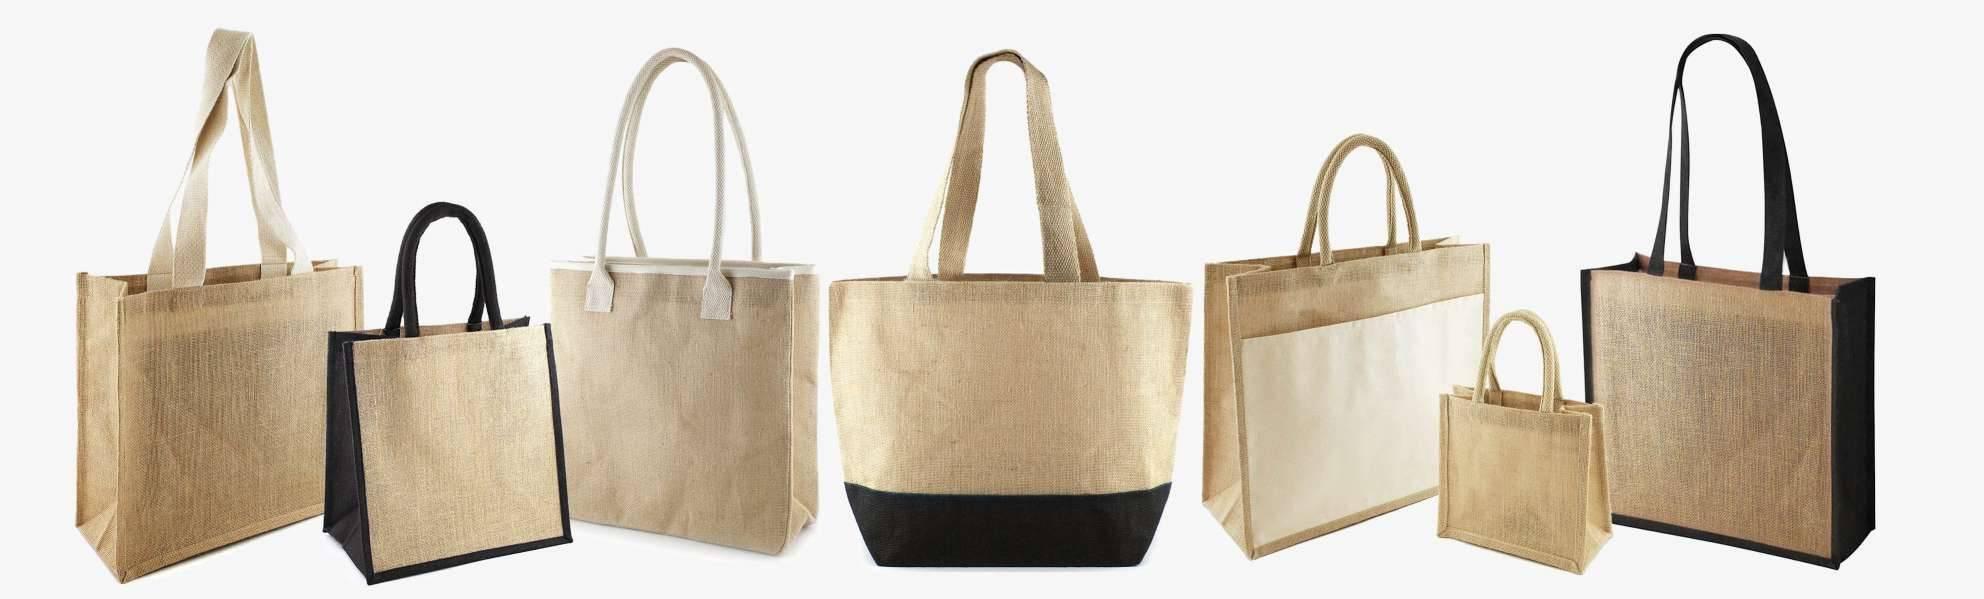 Jute Shopping/promotional Bag